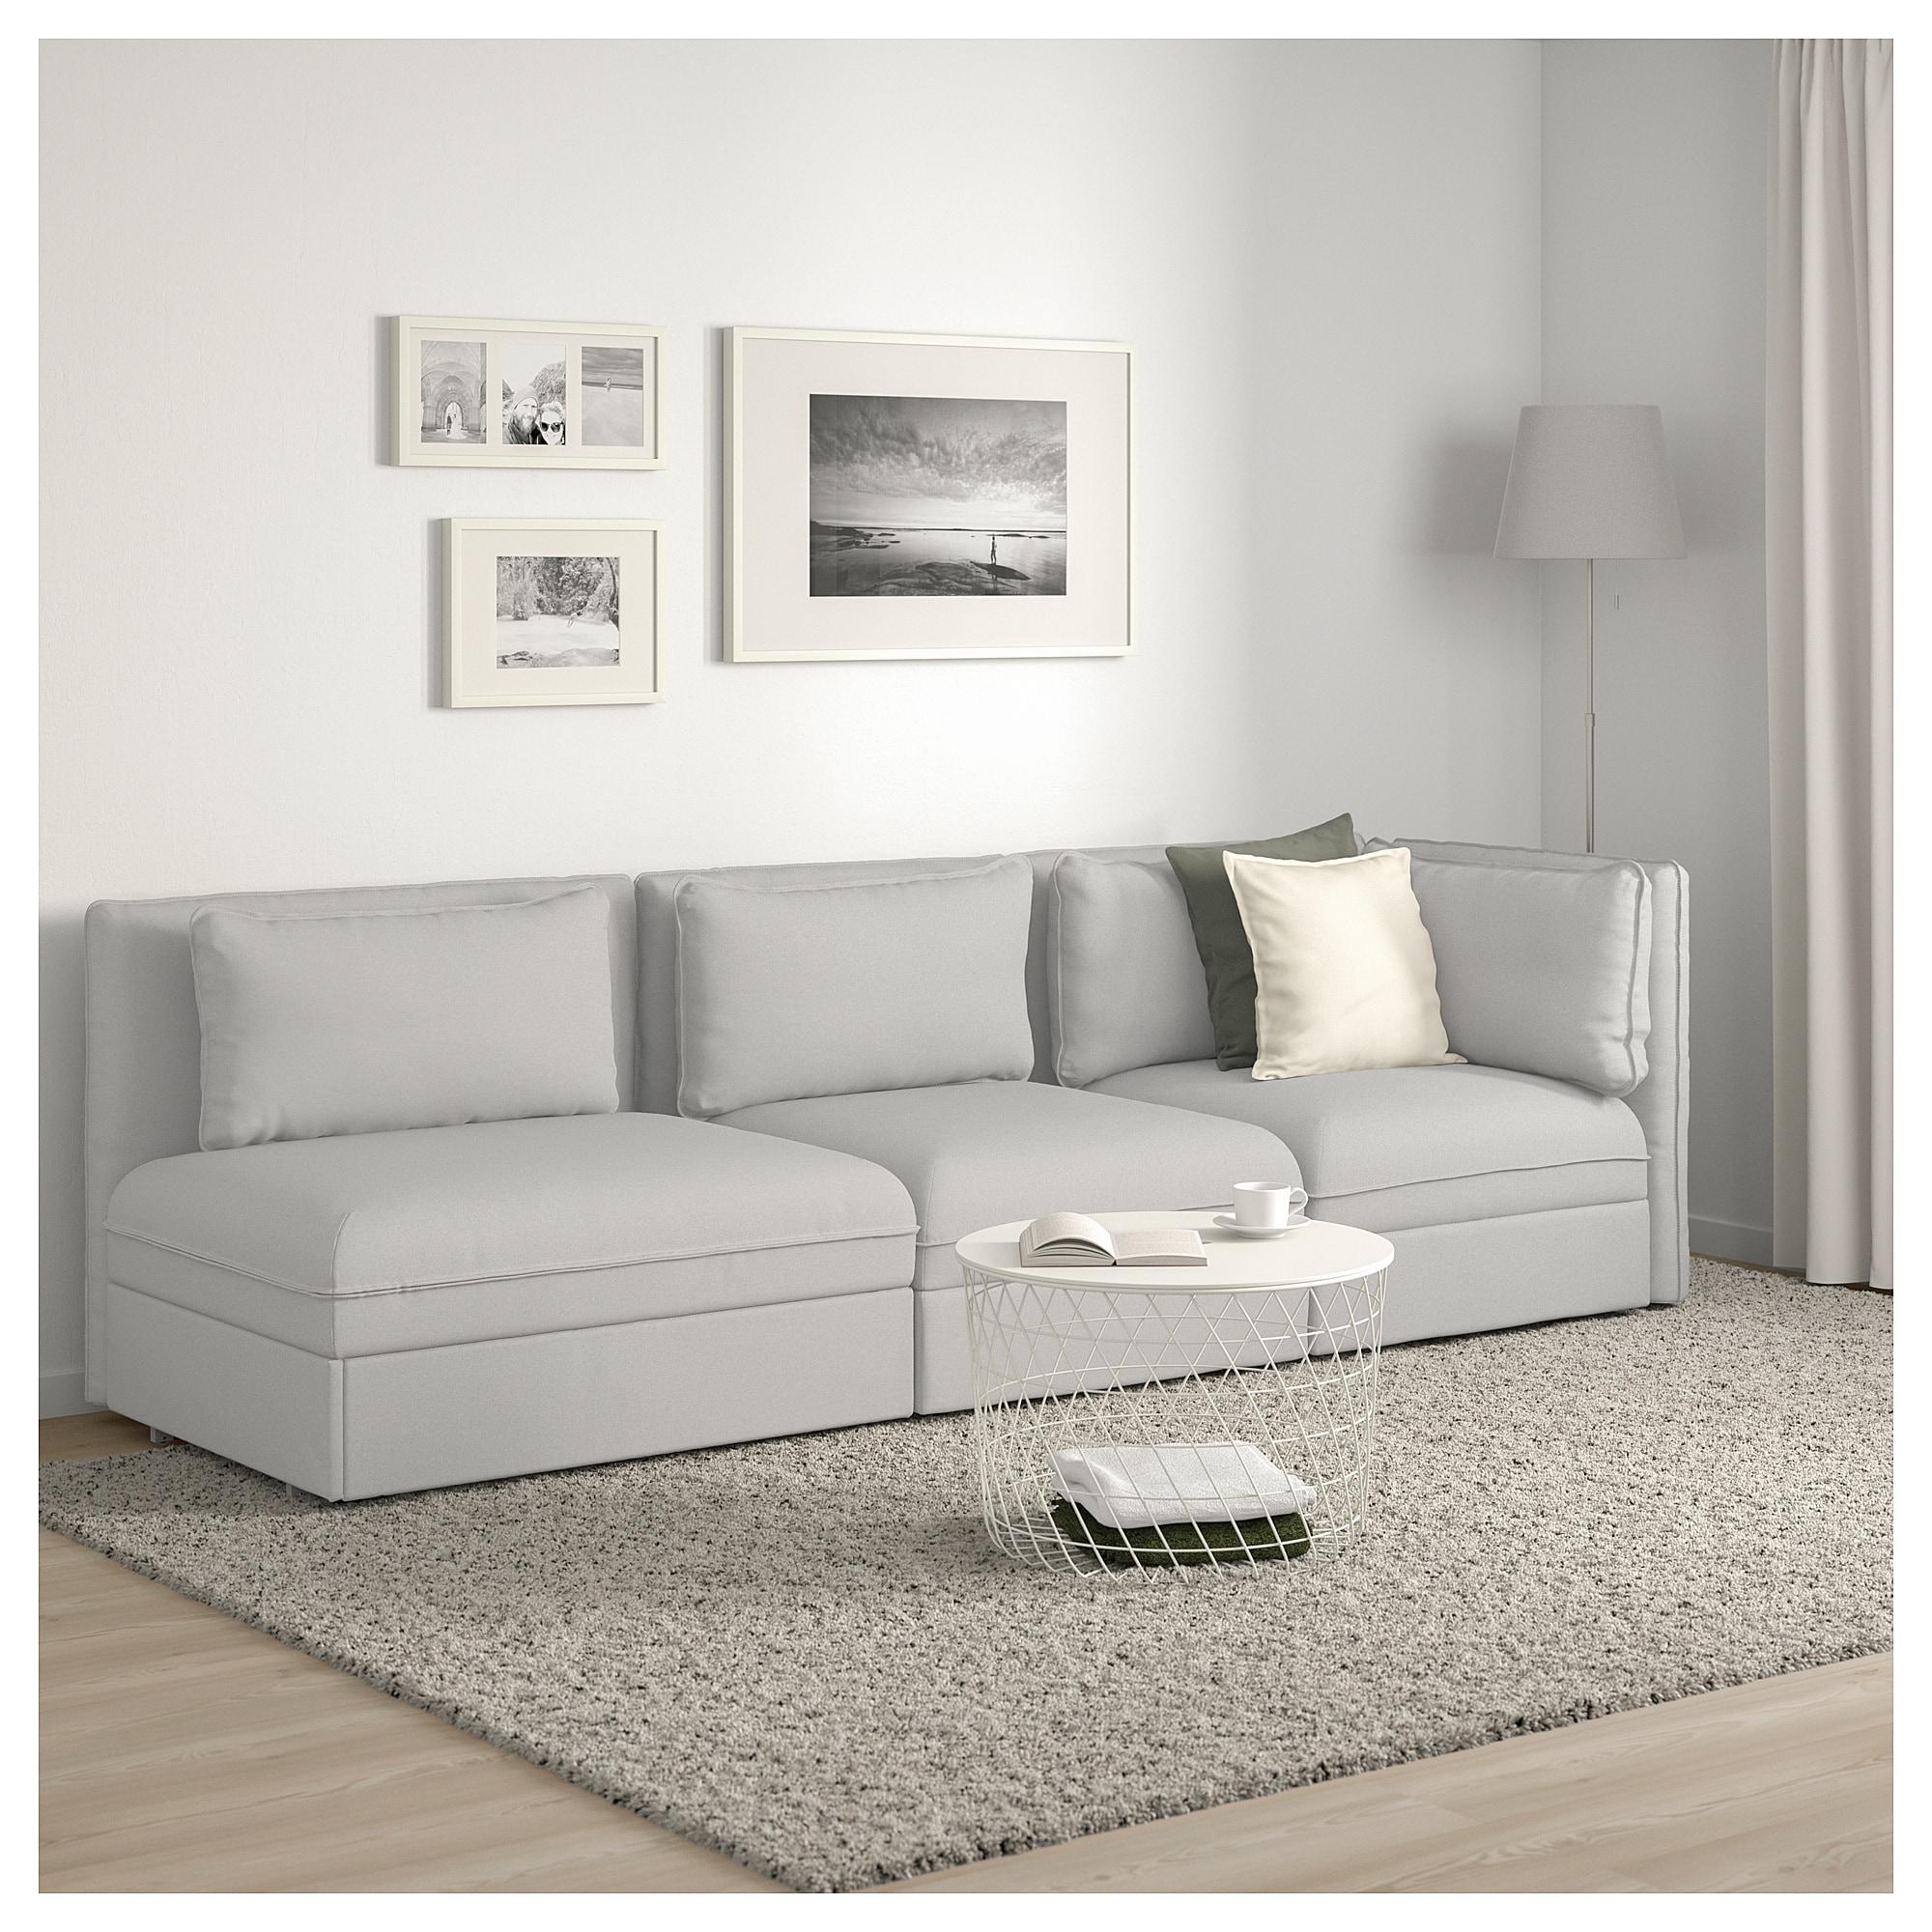 Sofas Modulares Ikea Budm Ikea Vallentuna 3 Seat Modular Sleeper sofa with Open End